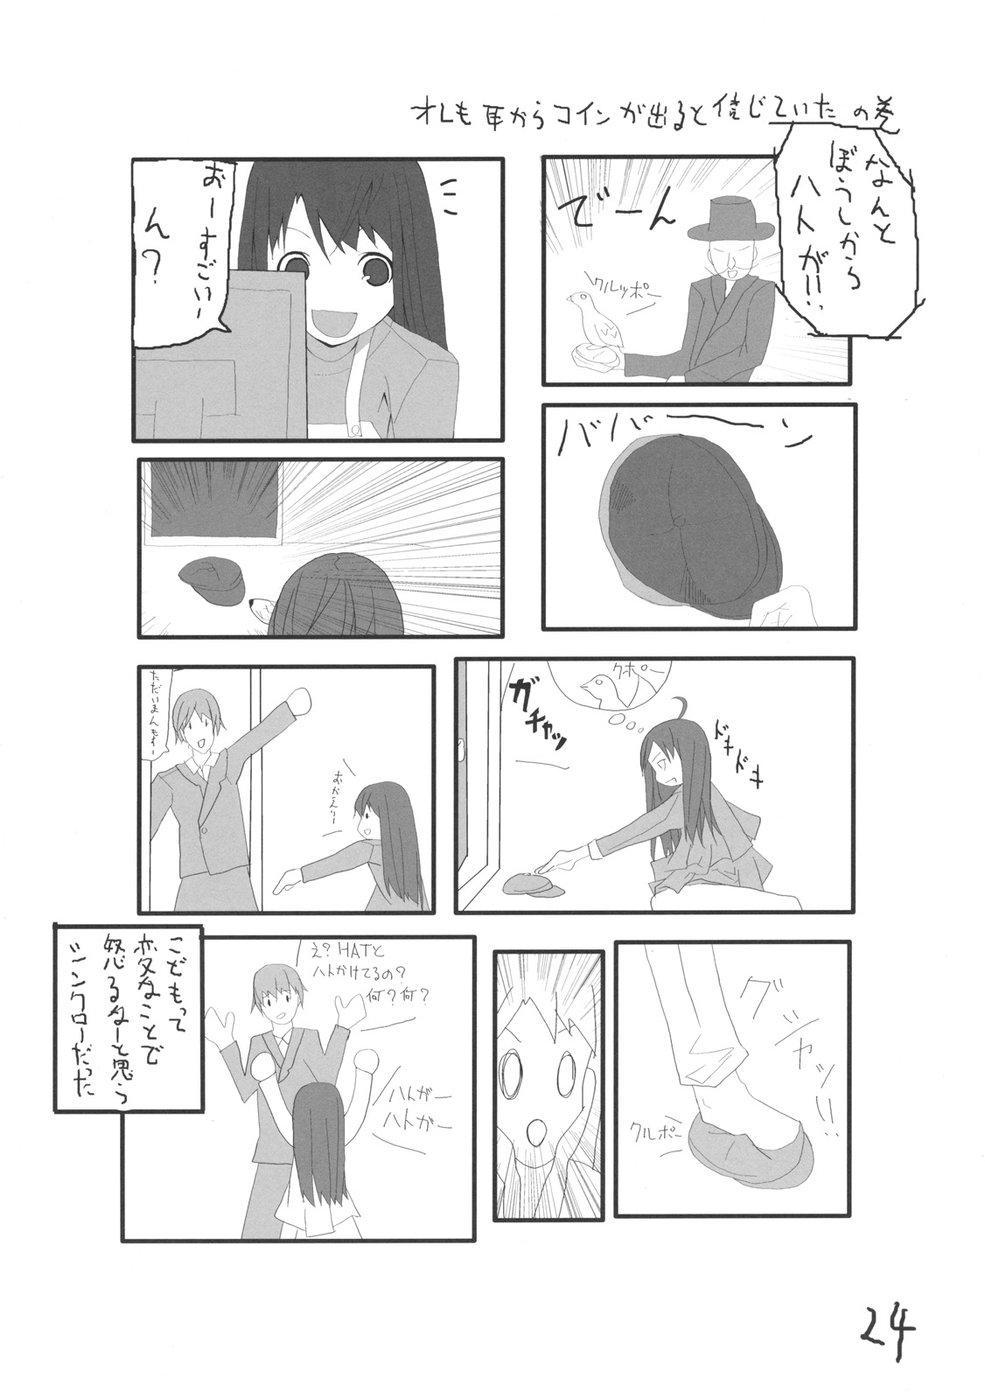 Kocchi no Murasaki 22